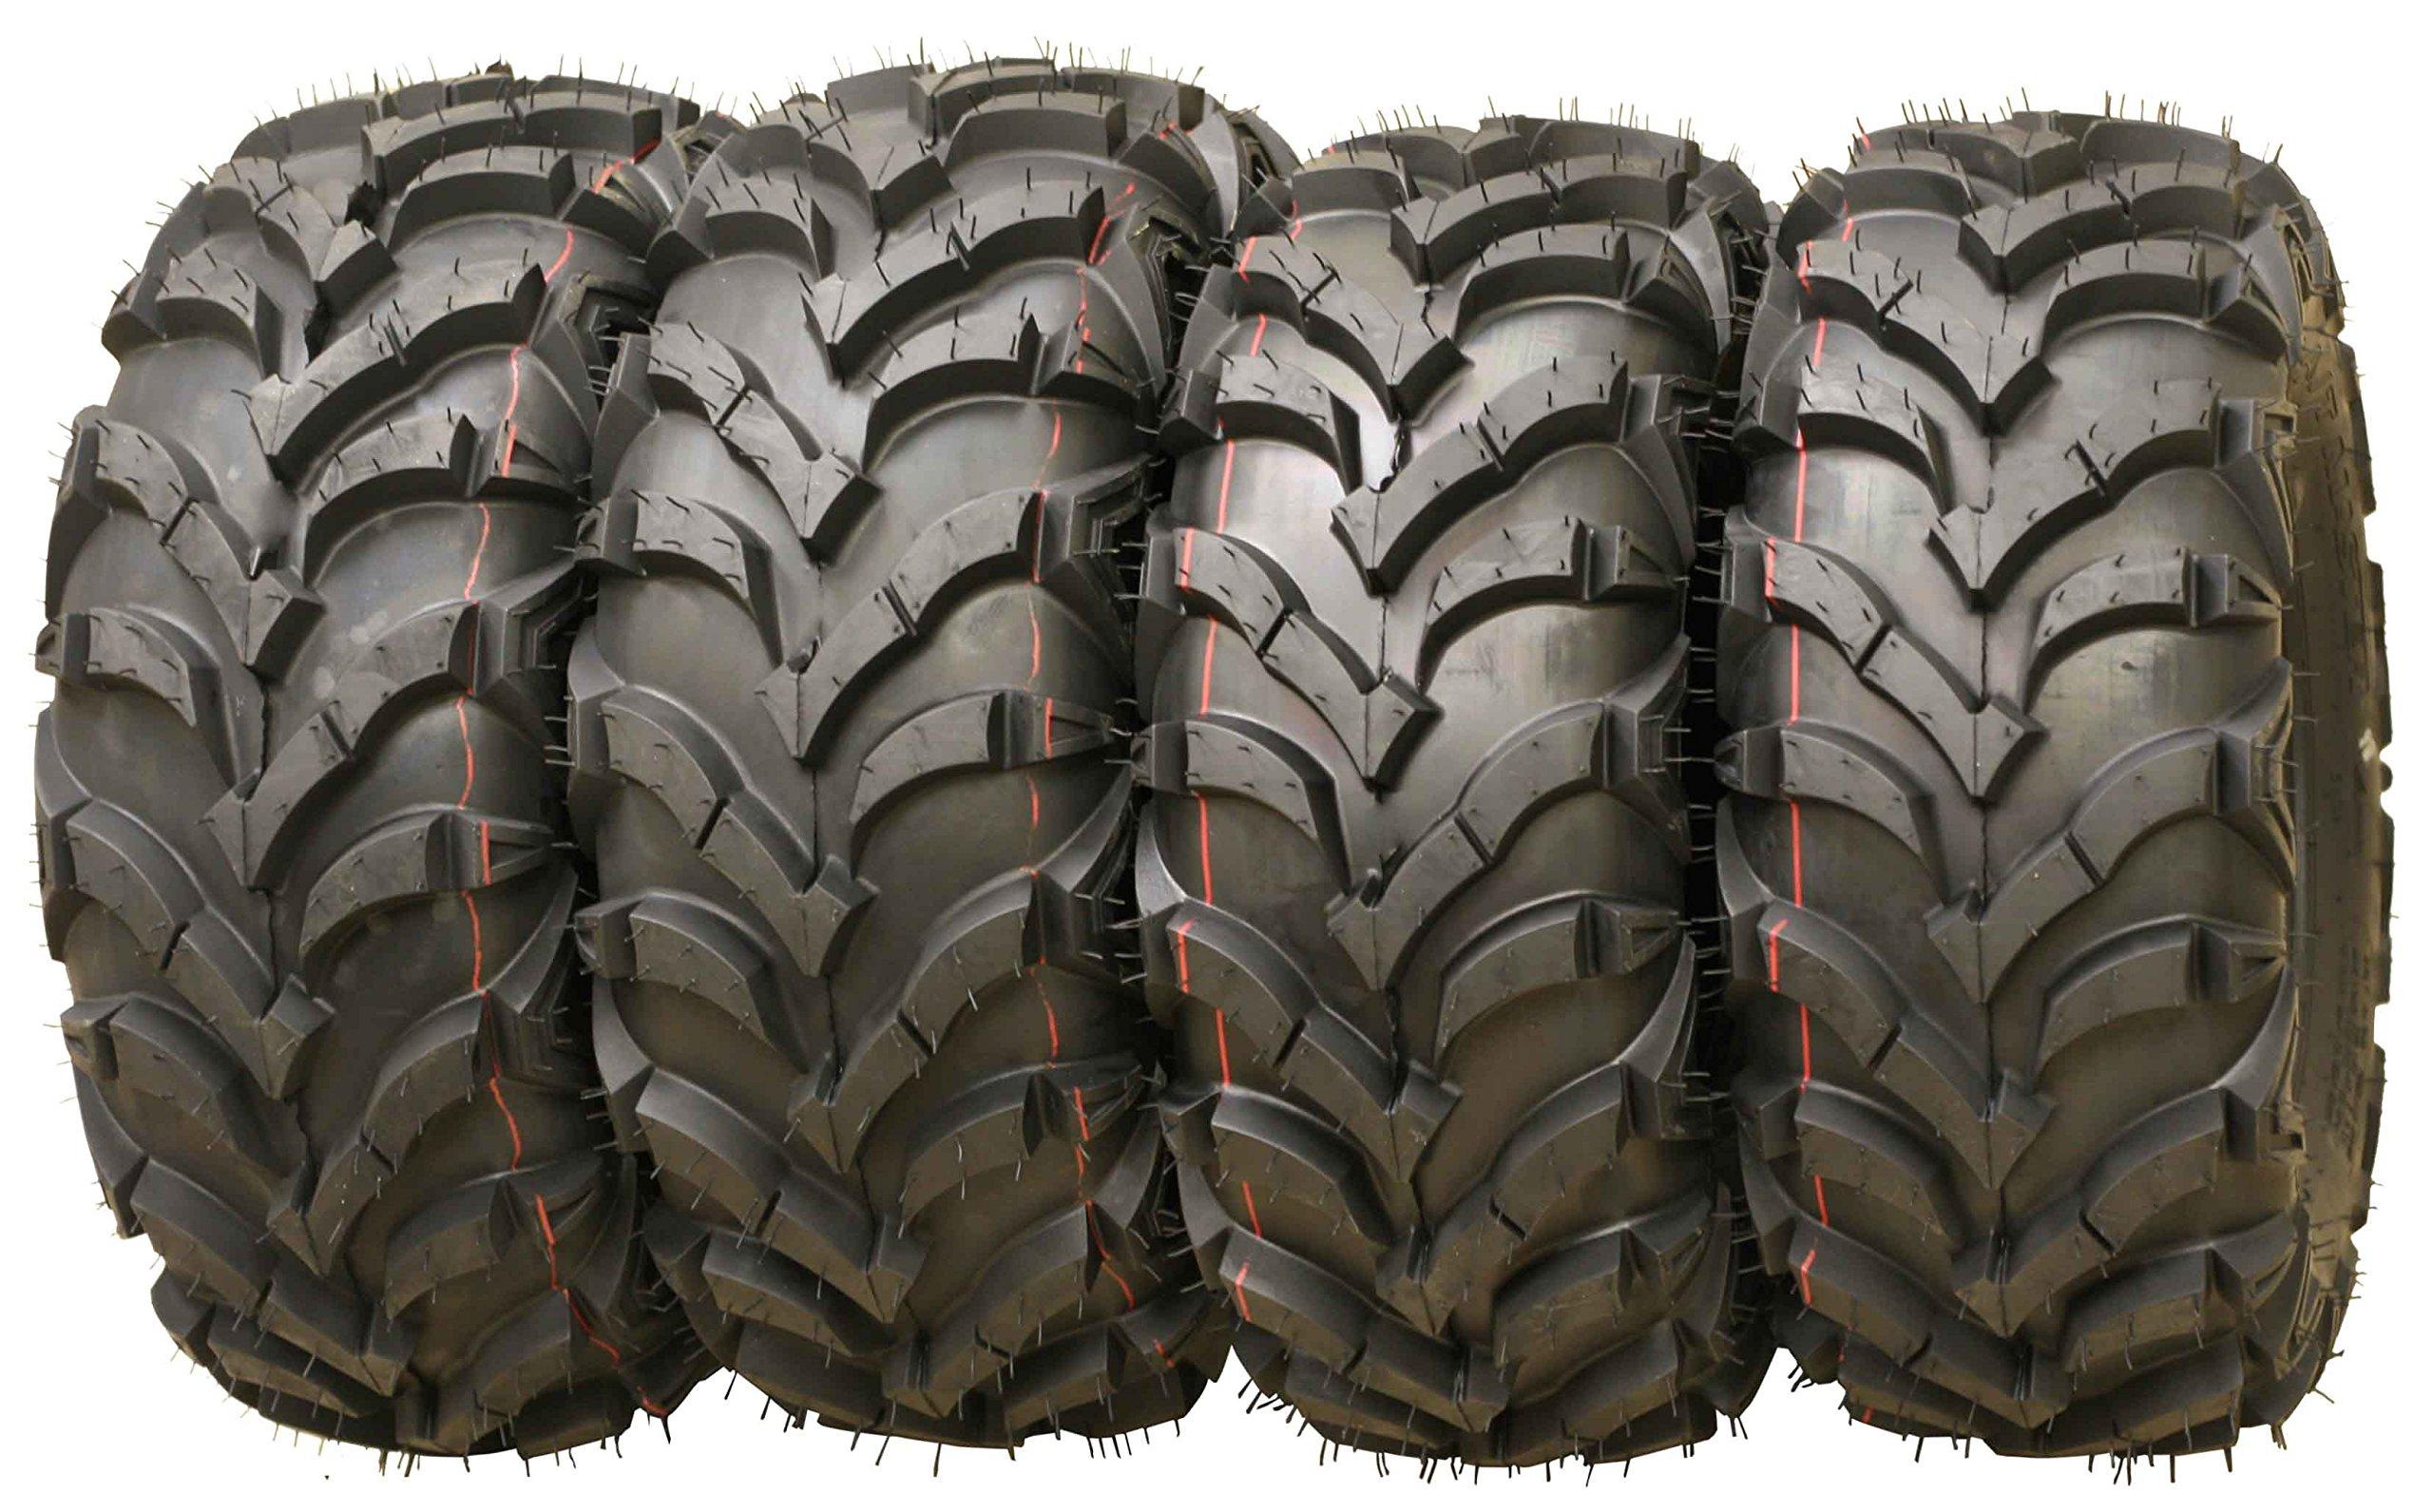 Set of 4 New ATV/UTV Tires 24x8-12 Front & 24x11-10 Rear /6PR P341 -10151/10245 …